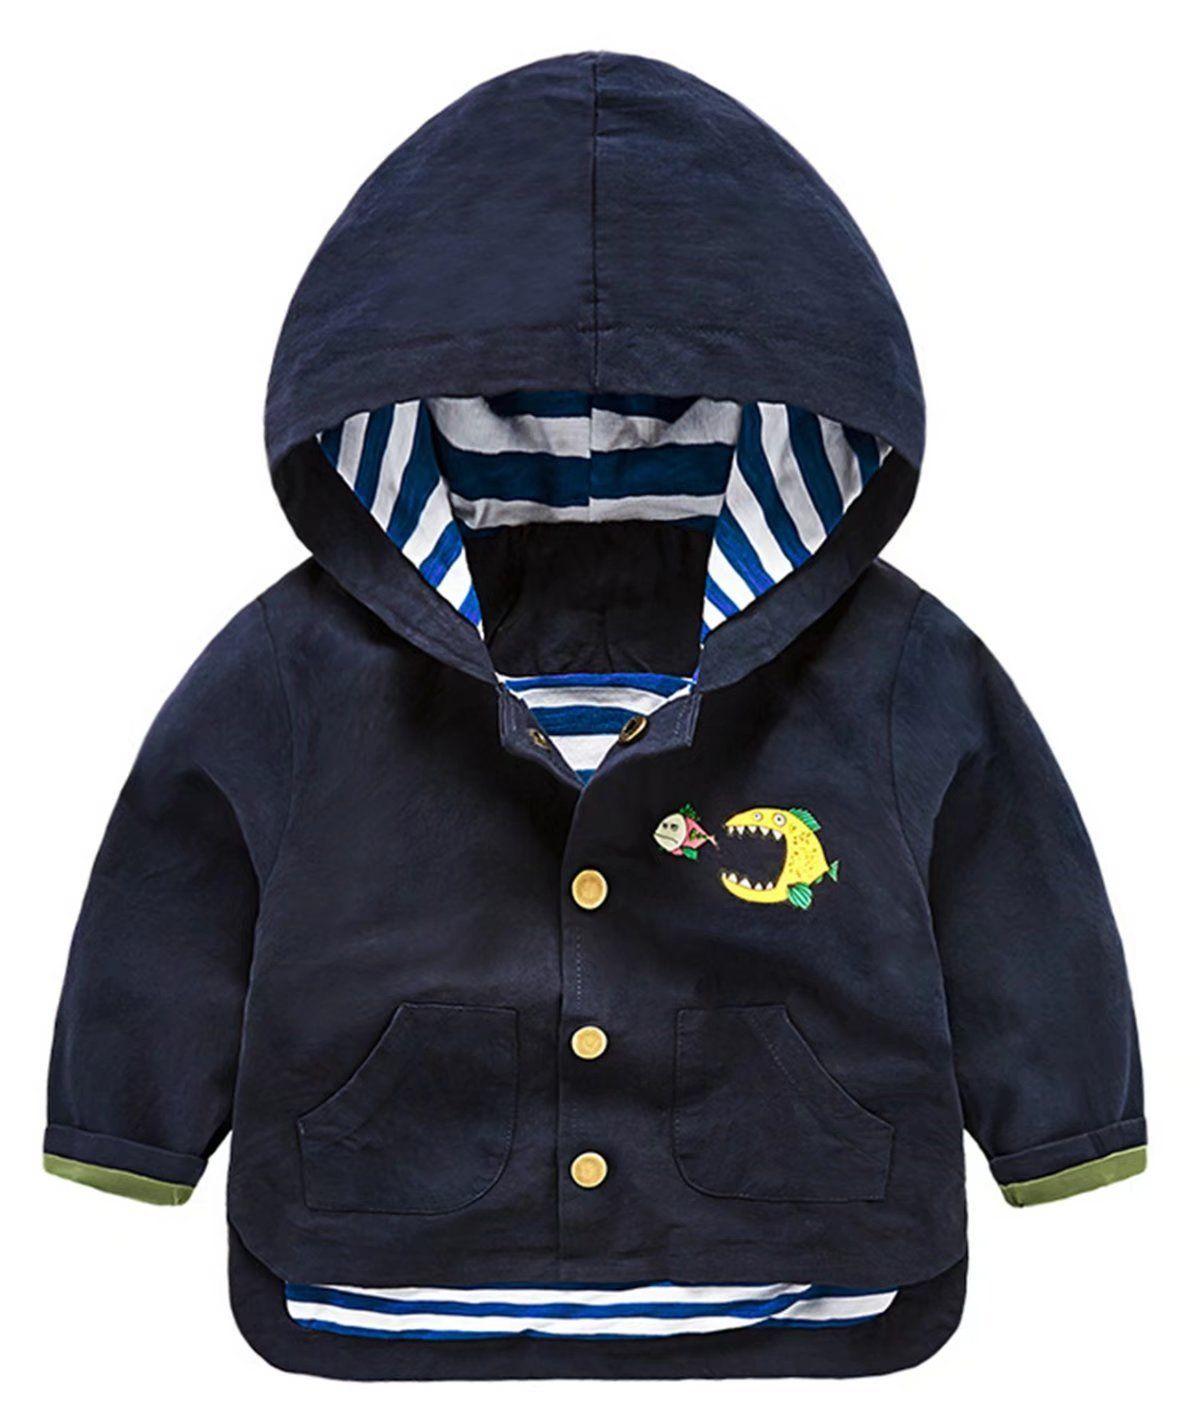 Betusline Unisex Kids Baby Boys Hood Coat Jacket Outwear Hoodies Material Cotton Blended Solid Color Long Sleeves P Kids Outerwear Outwear Jackets Kids Coats [ 1426 x 1200 Pixel ]